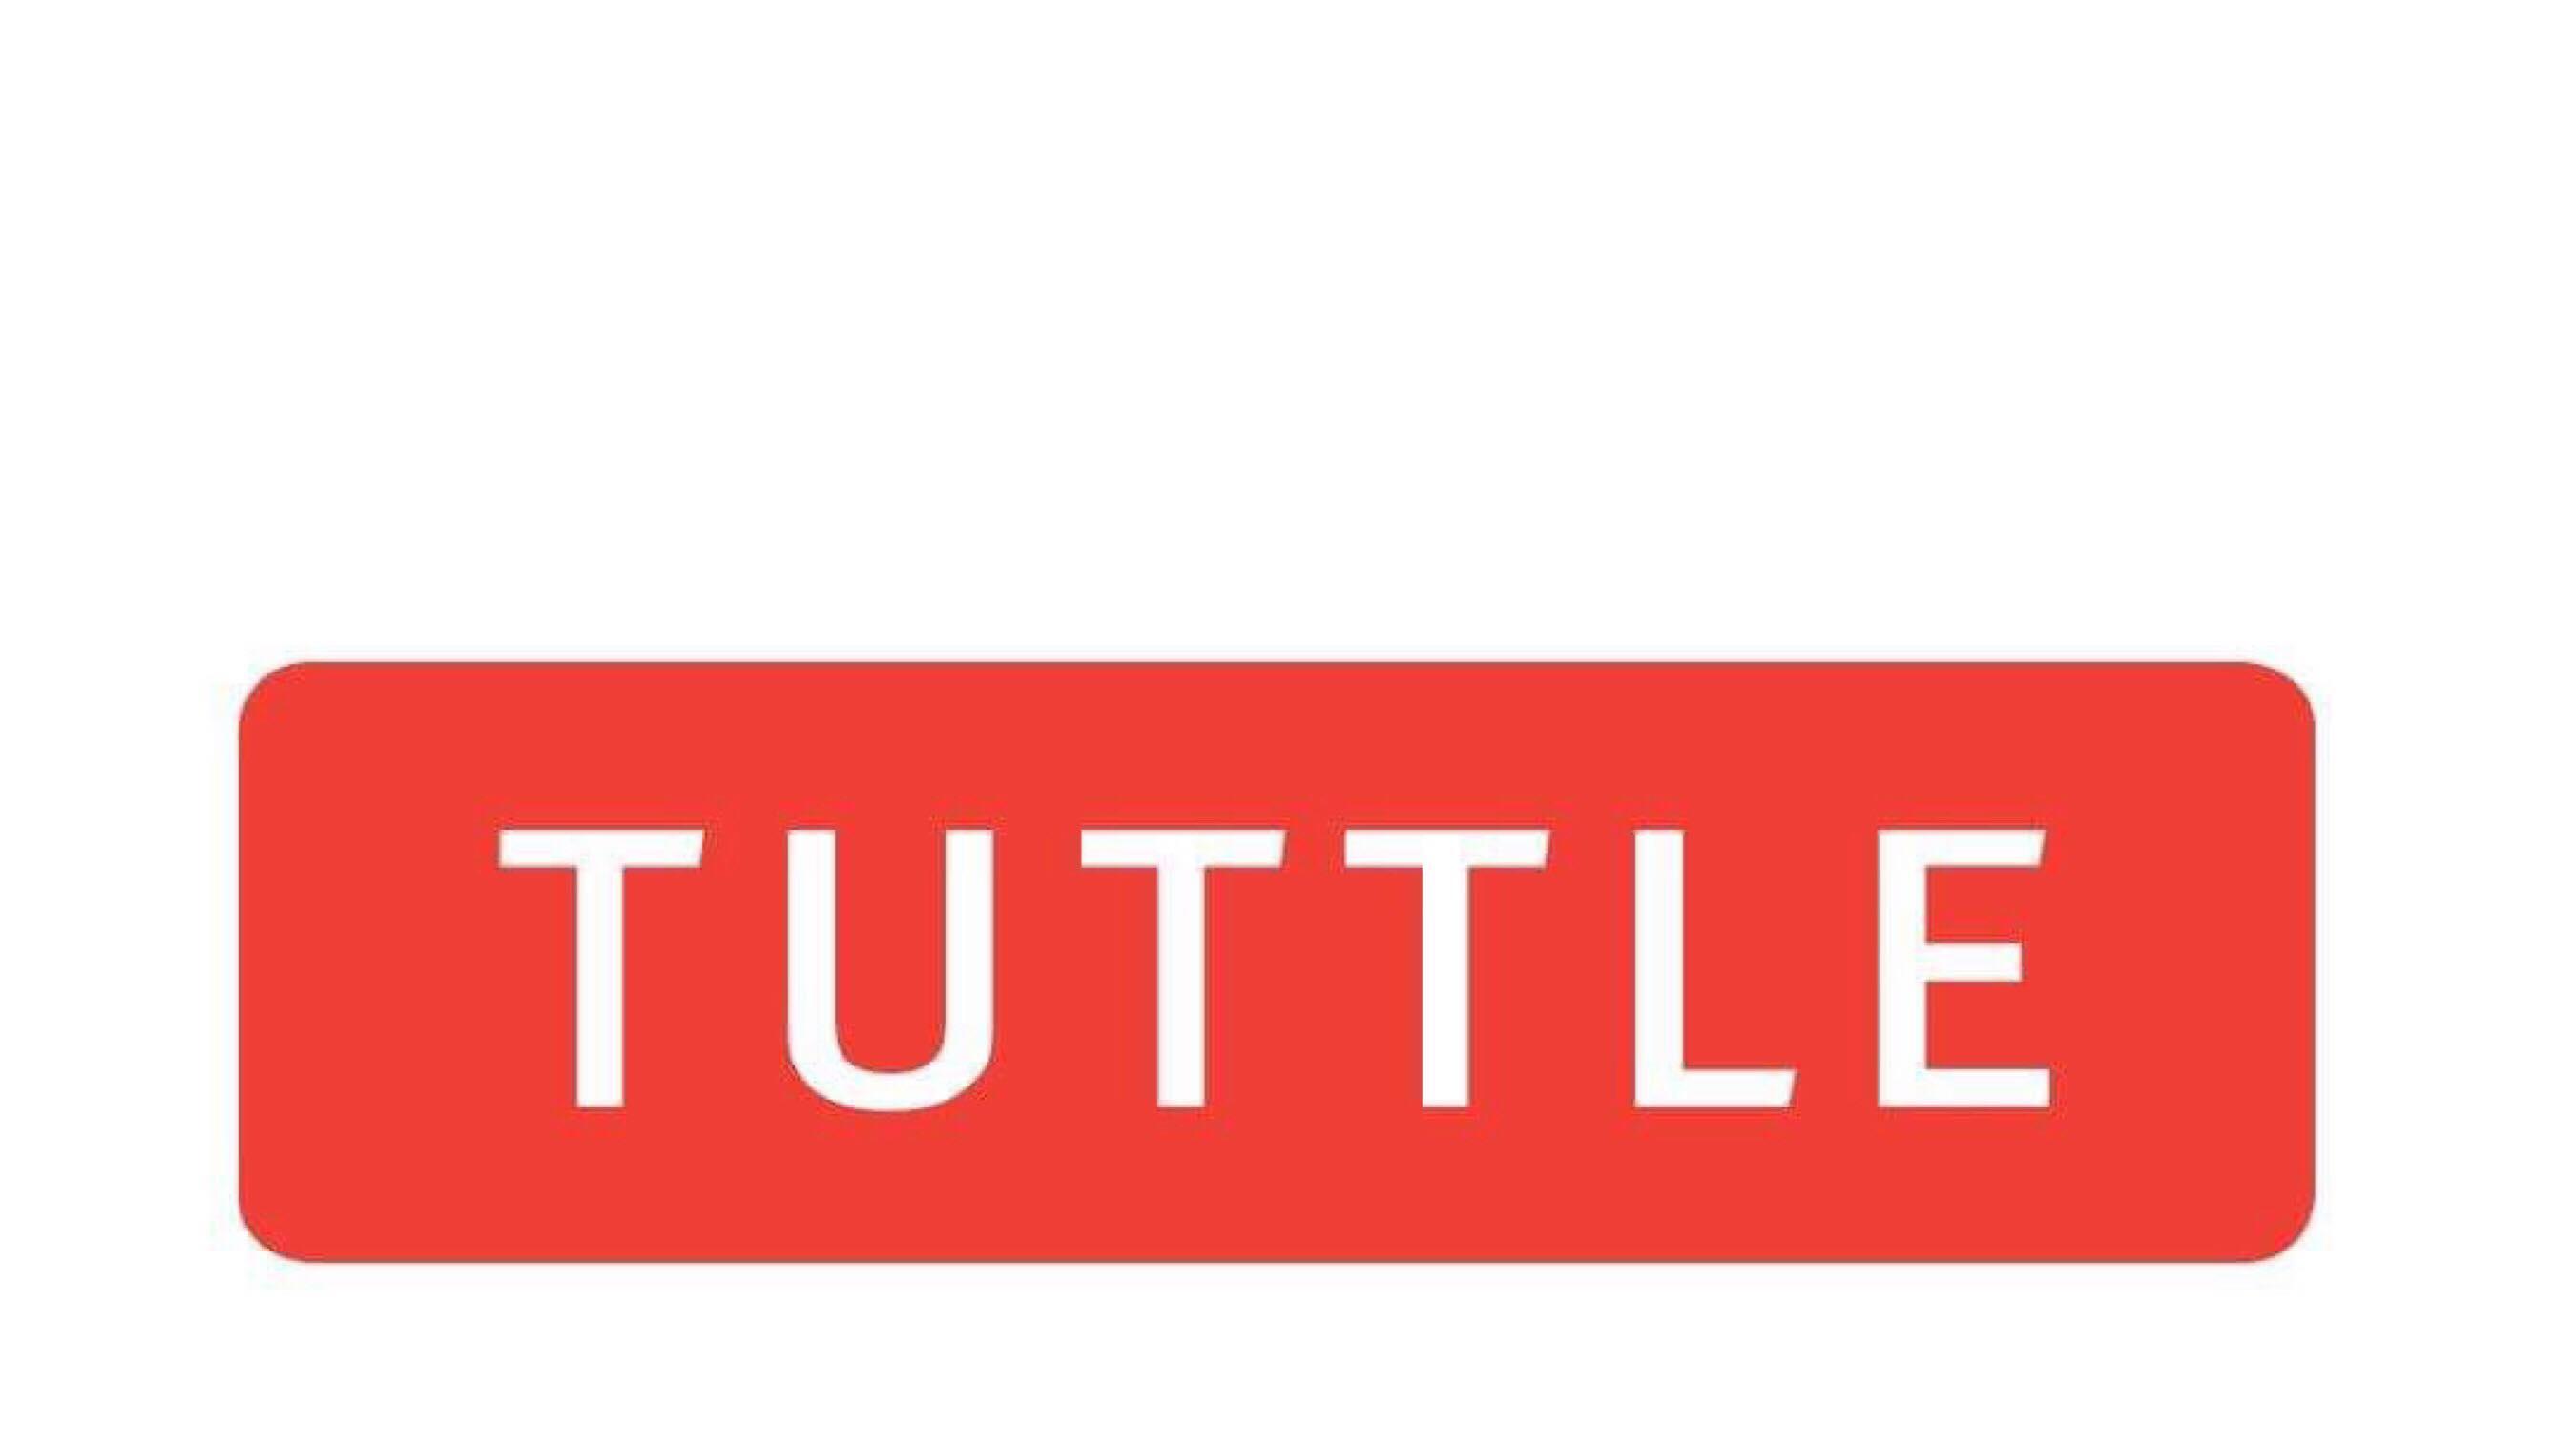 Tuttle